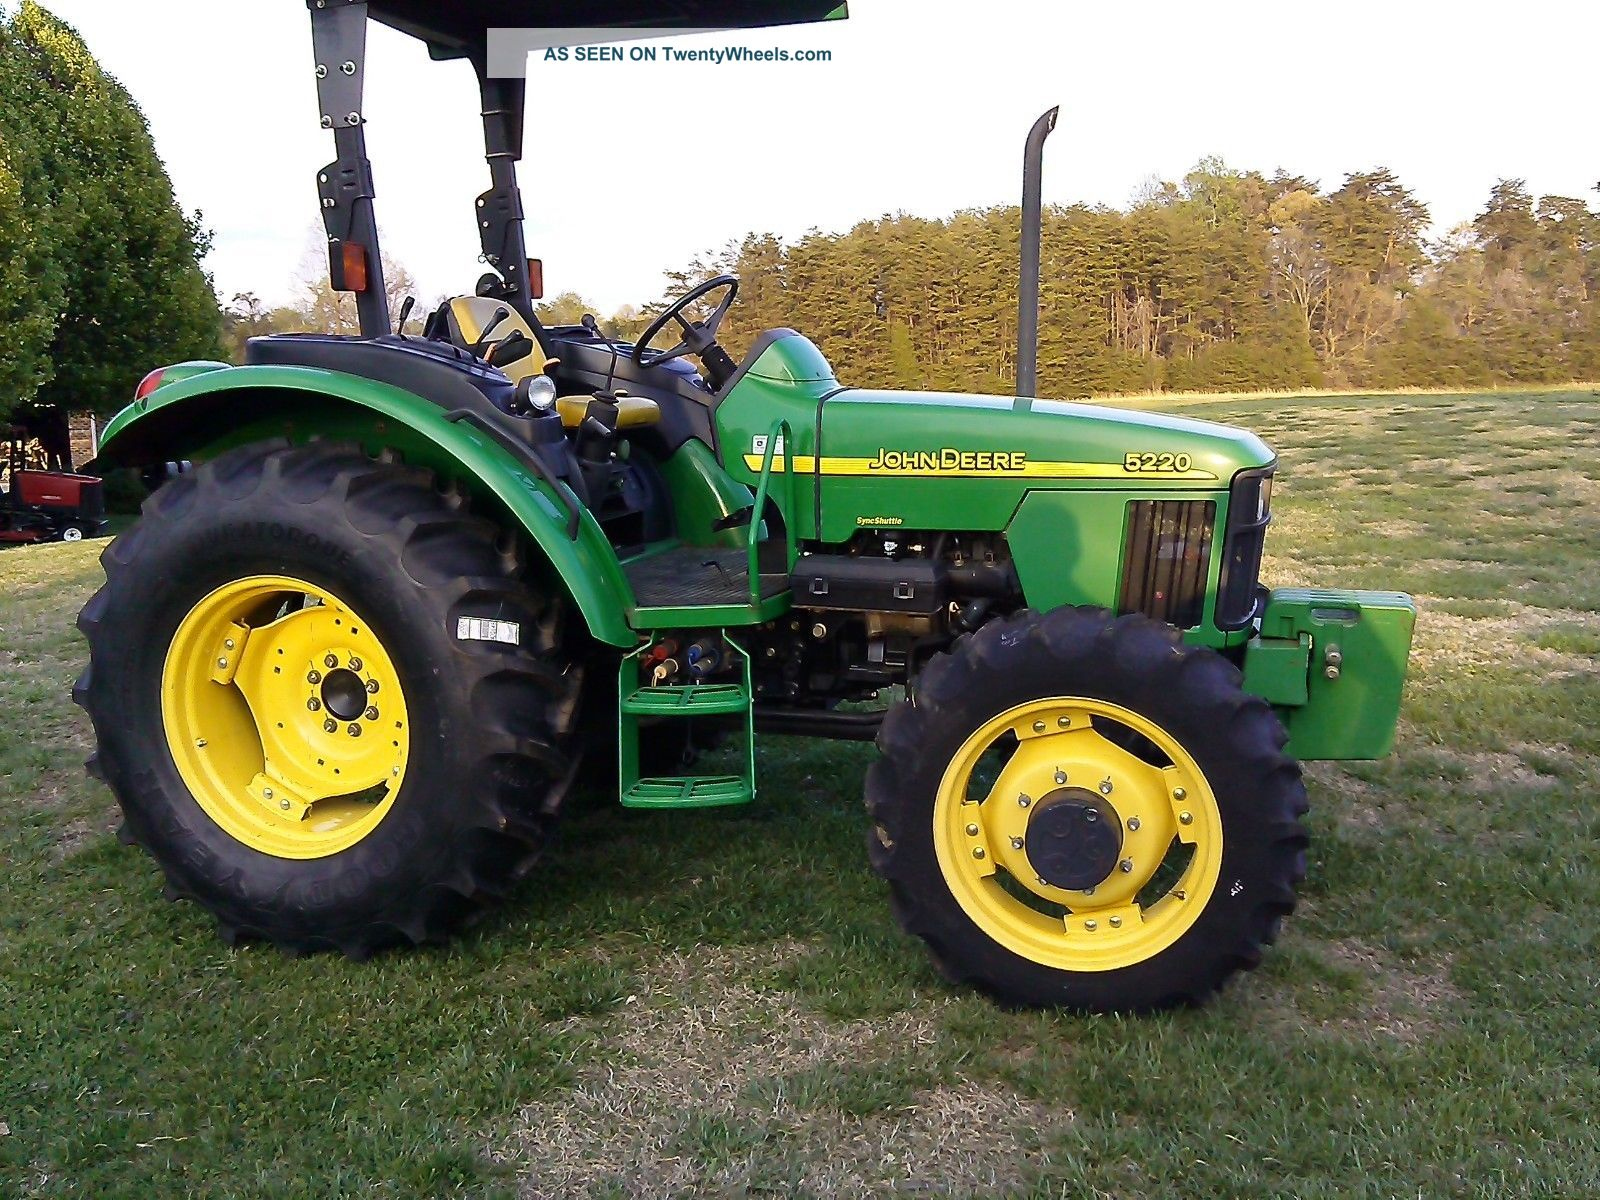 John Deere 5220 Tractor – John Deere 5220 Wiring Diagrams